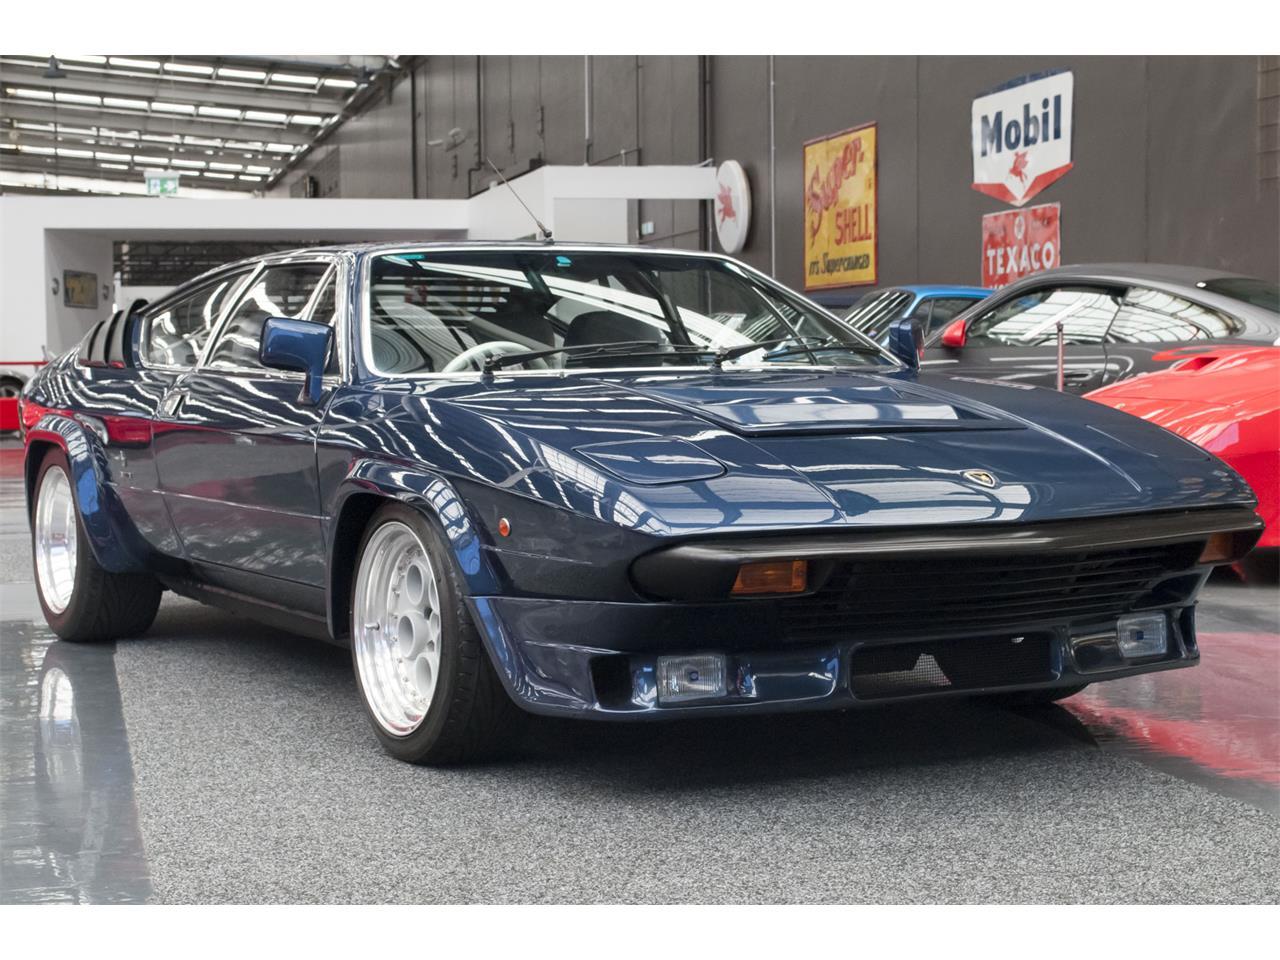 1974 Lamborghini Urraco P250 For Sale Classiccars Com Cc 959425